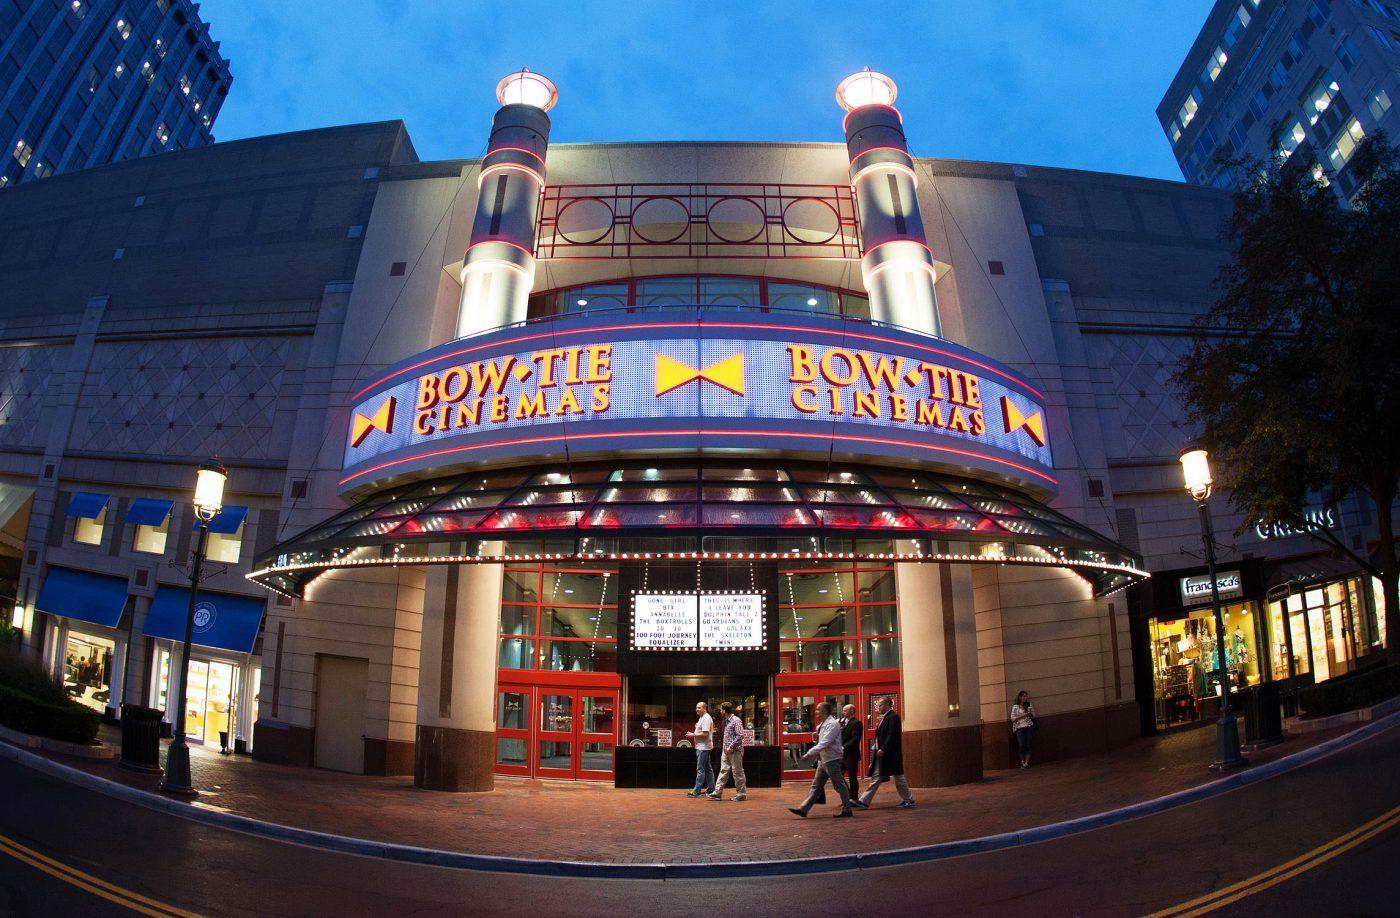 Bowtie cinemas movie theater at reston town center by